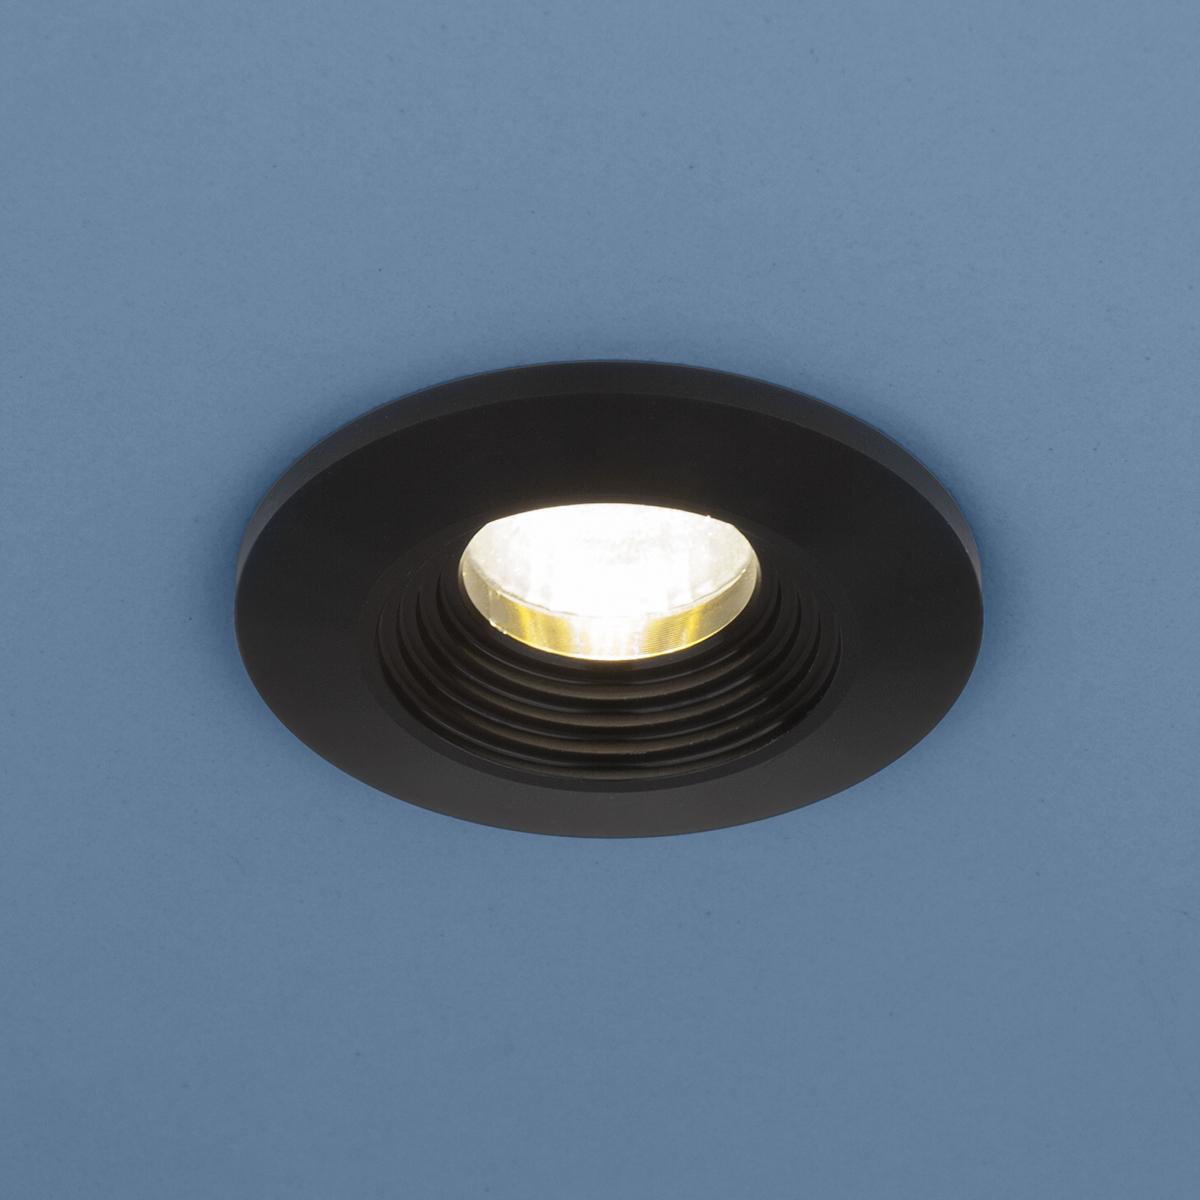 Встраиваемый светильник Elektrostandard Точечный светодиодный 9903 LED 3W COB BK jrled 3w 300lm 6500k 21 cob led white light modules white beige 5 pcs dc 10 11v